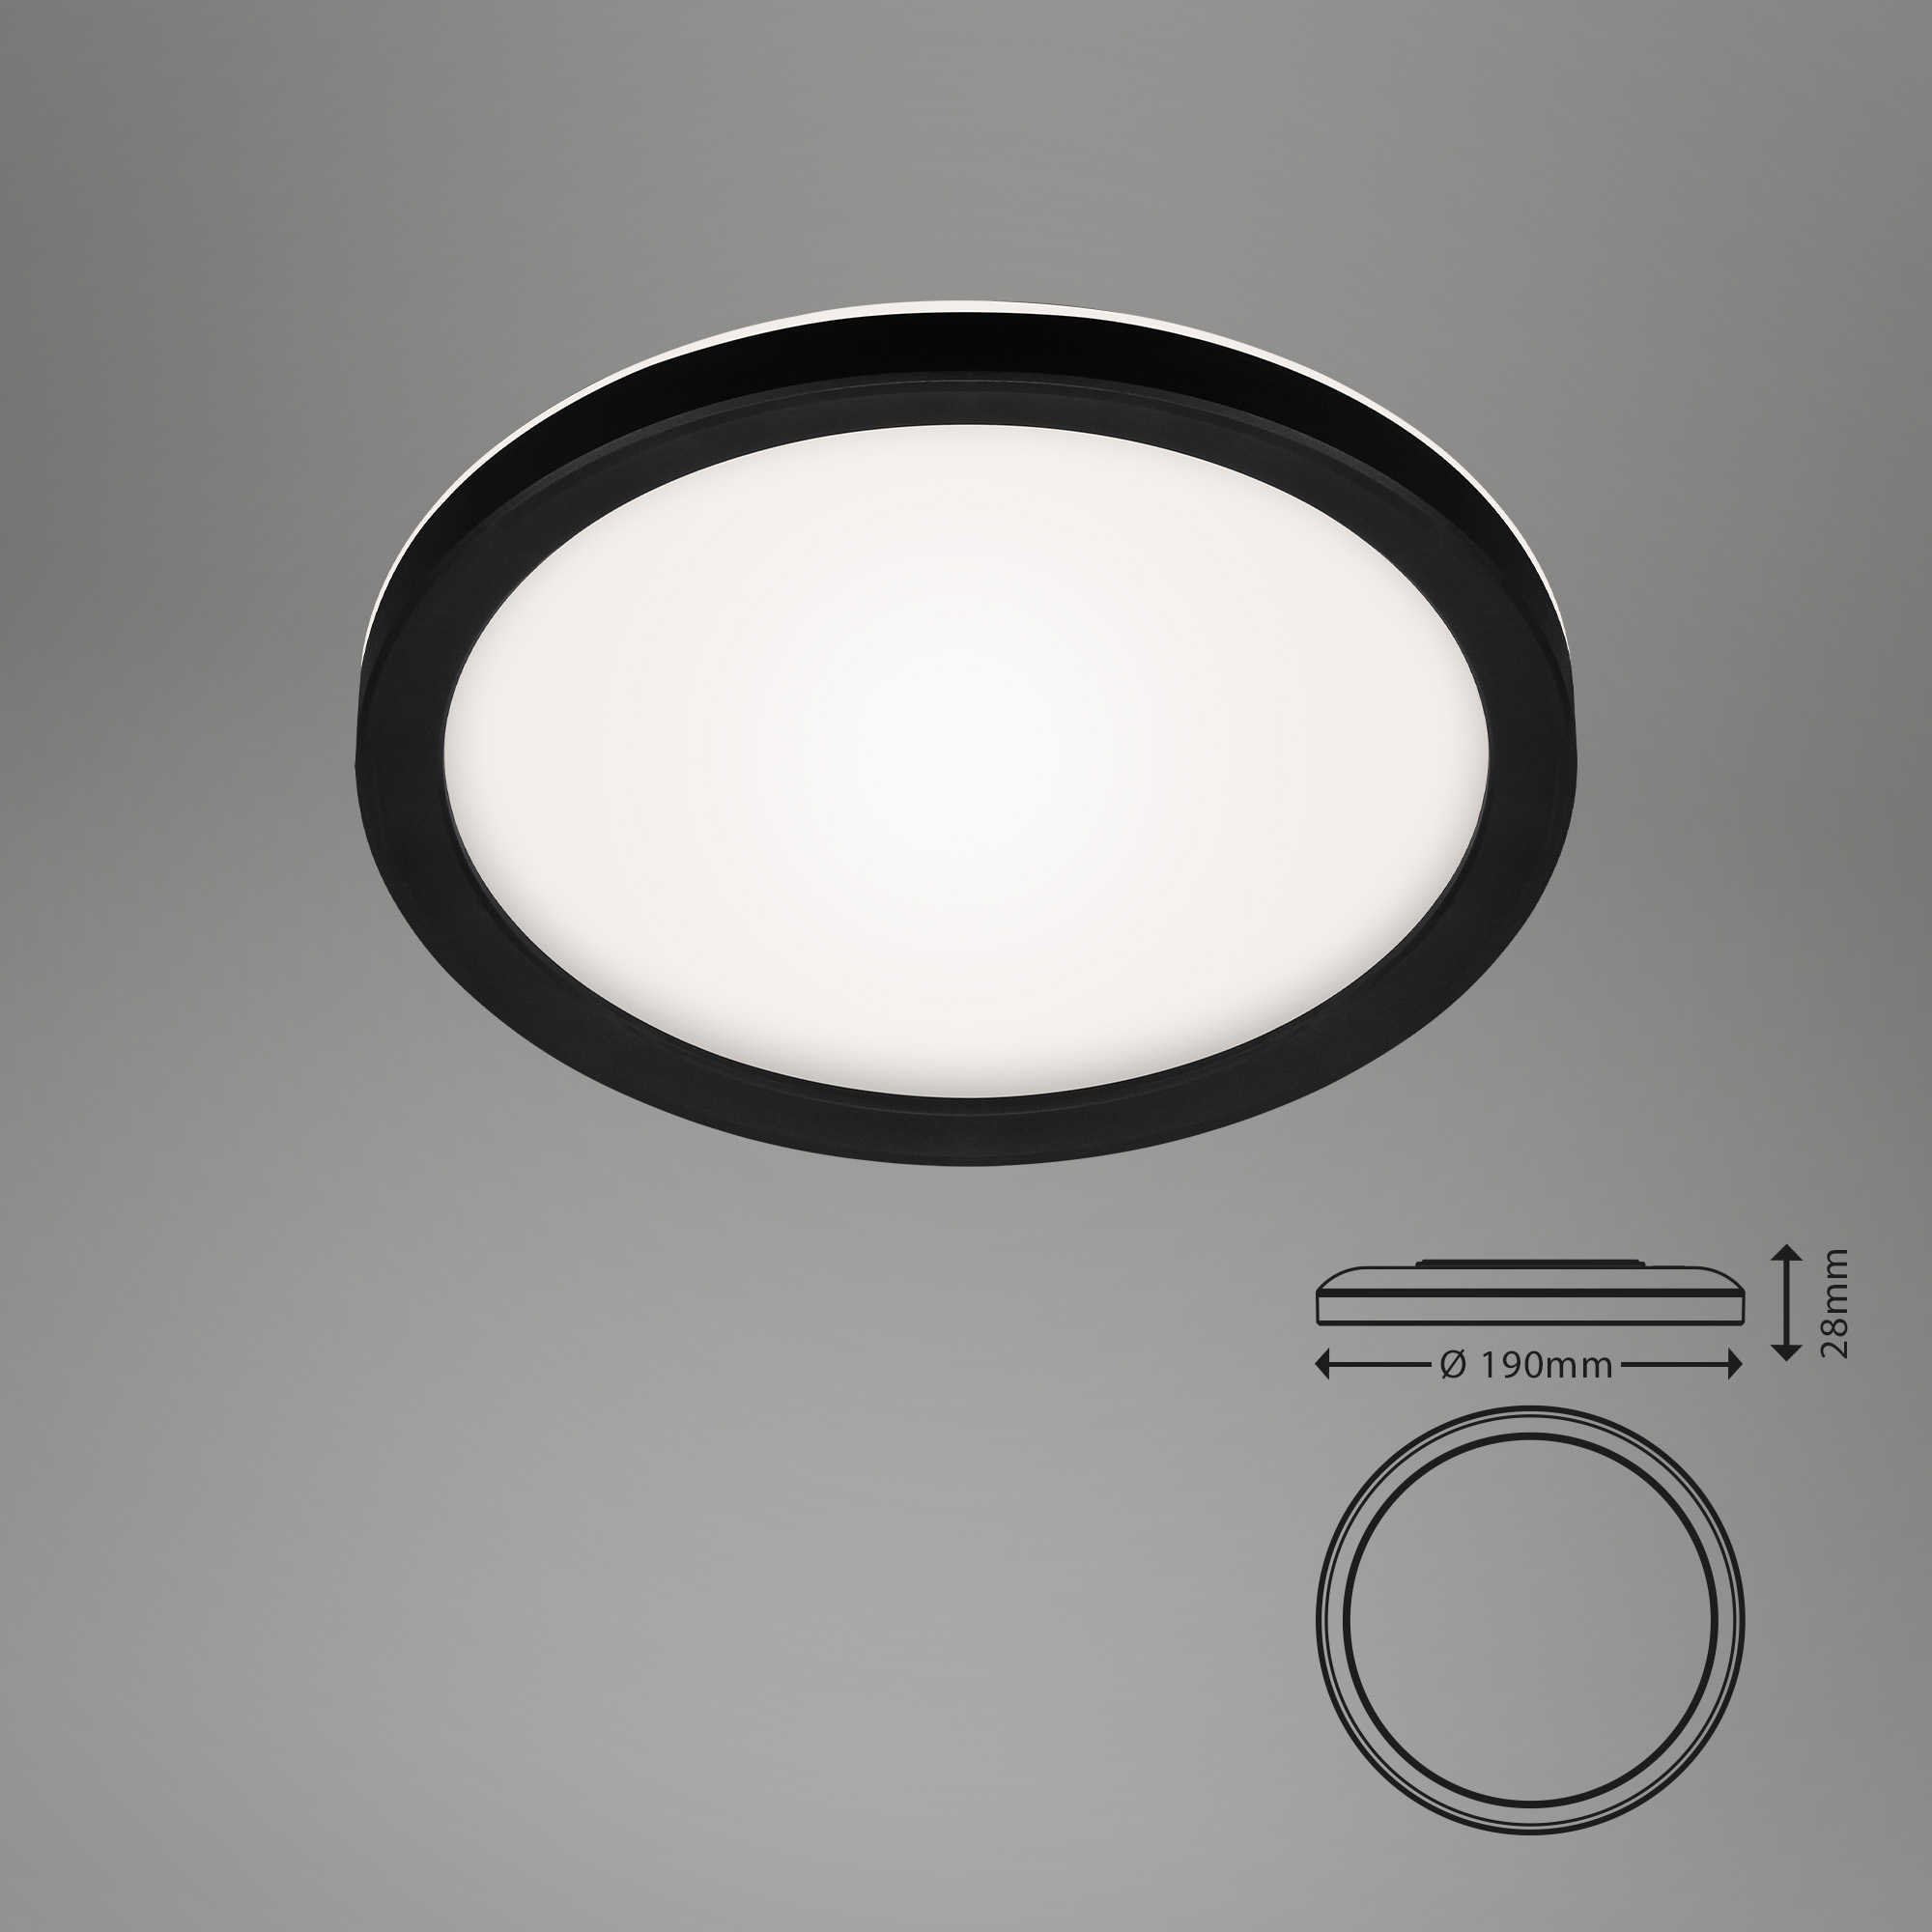 SLIM LED Panel, Ø 19 cm, 12 W, Schwarz